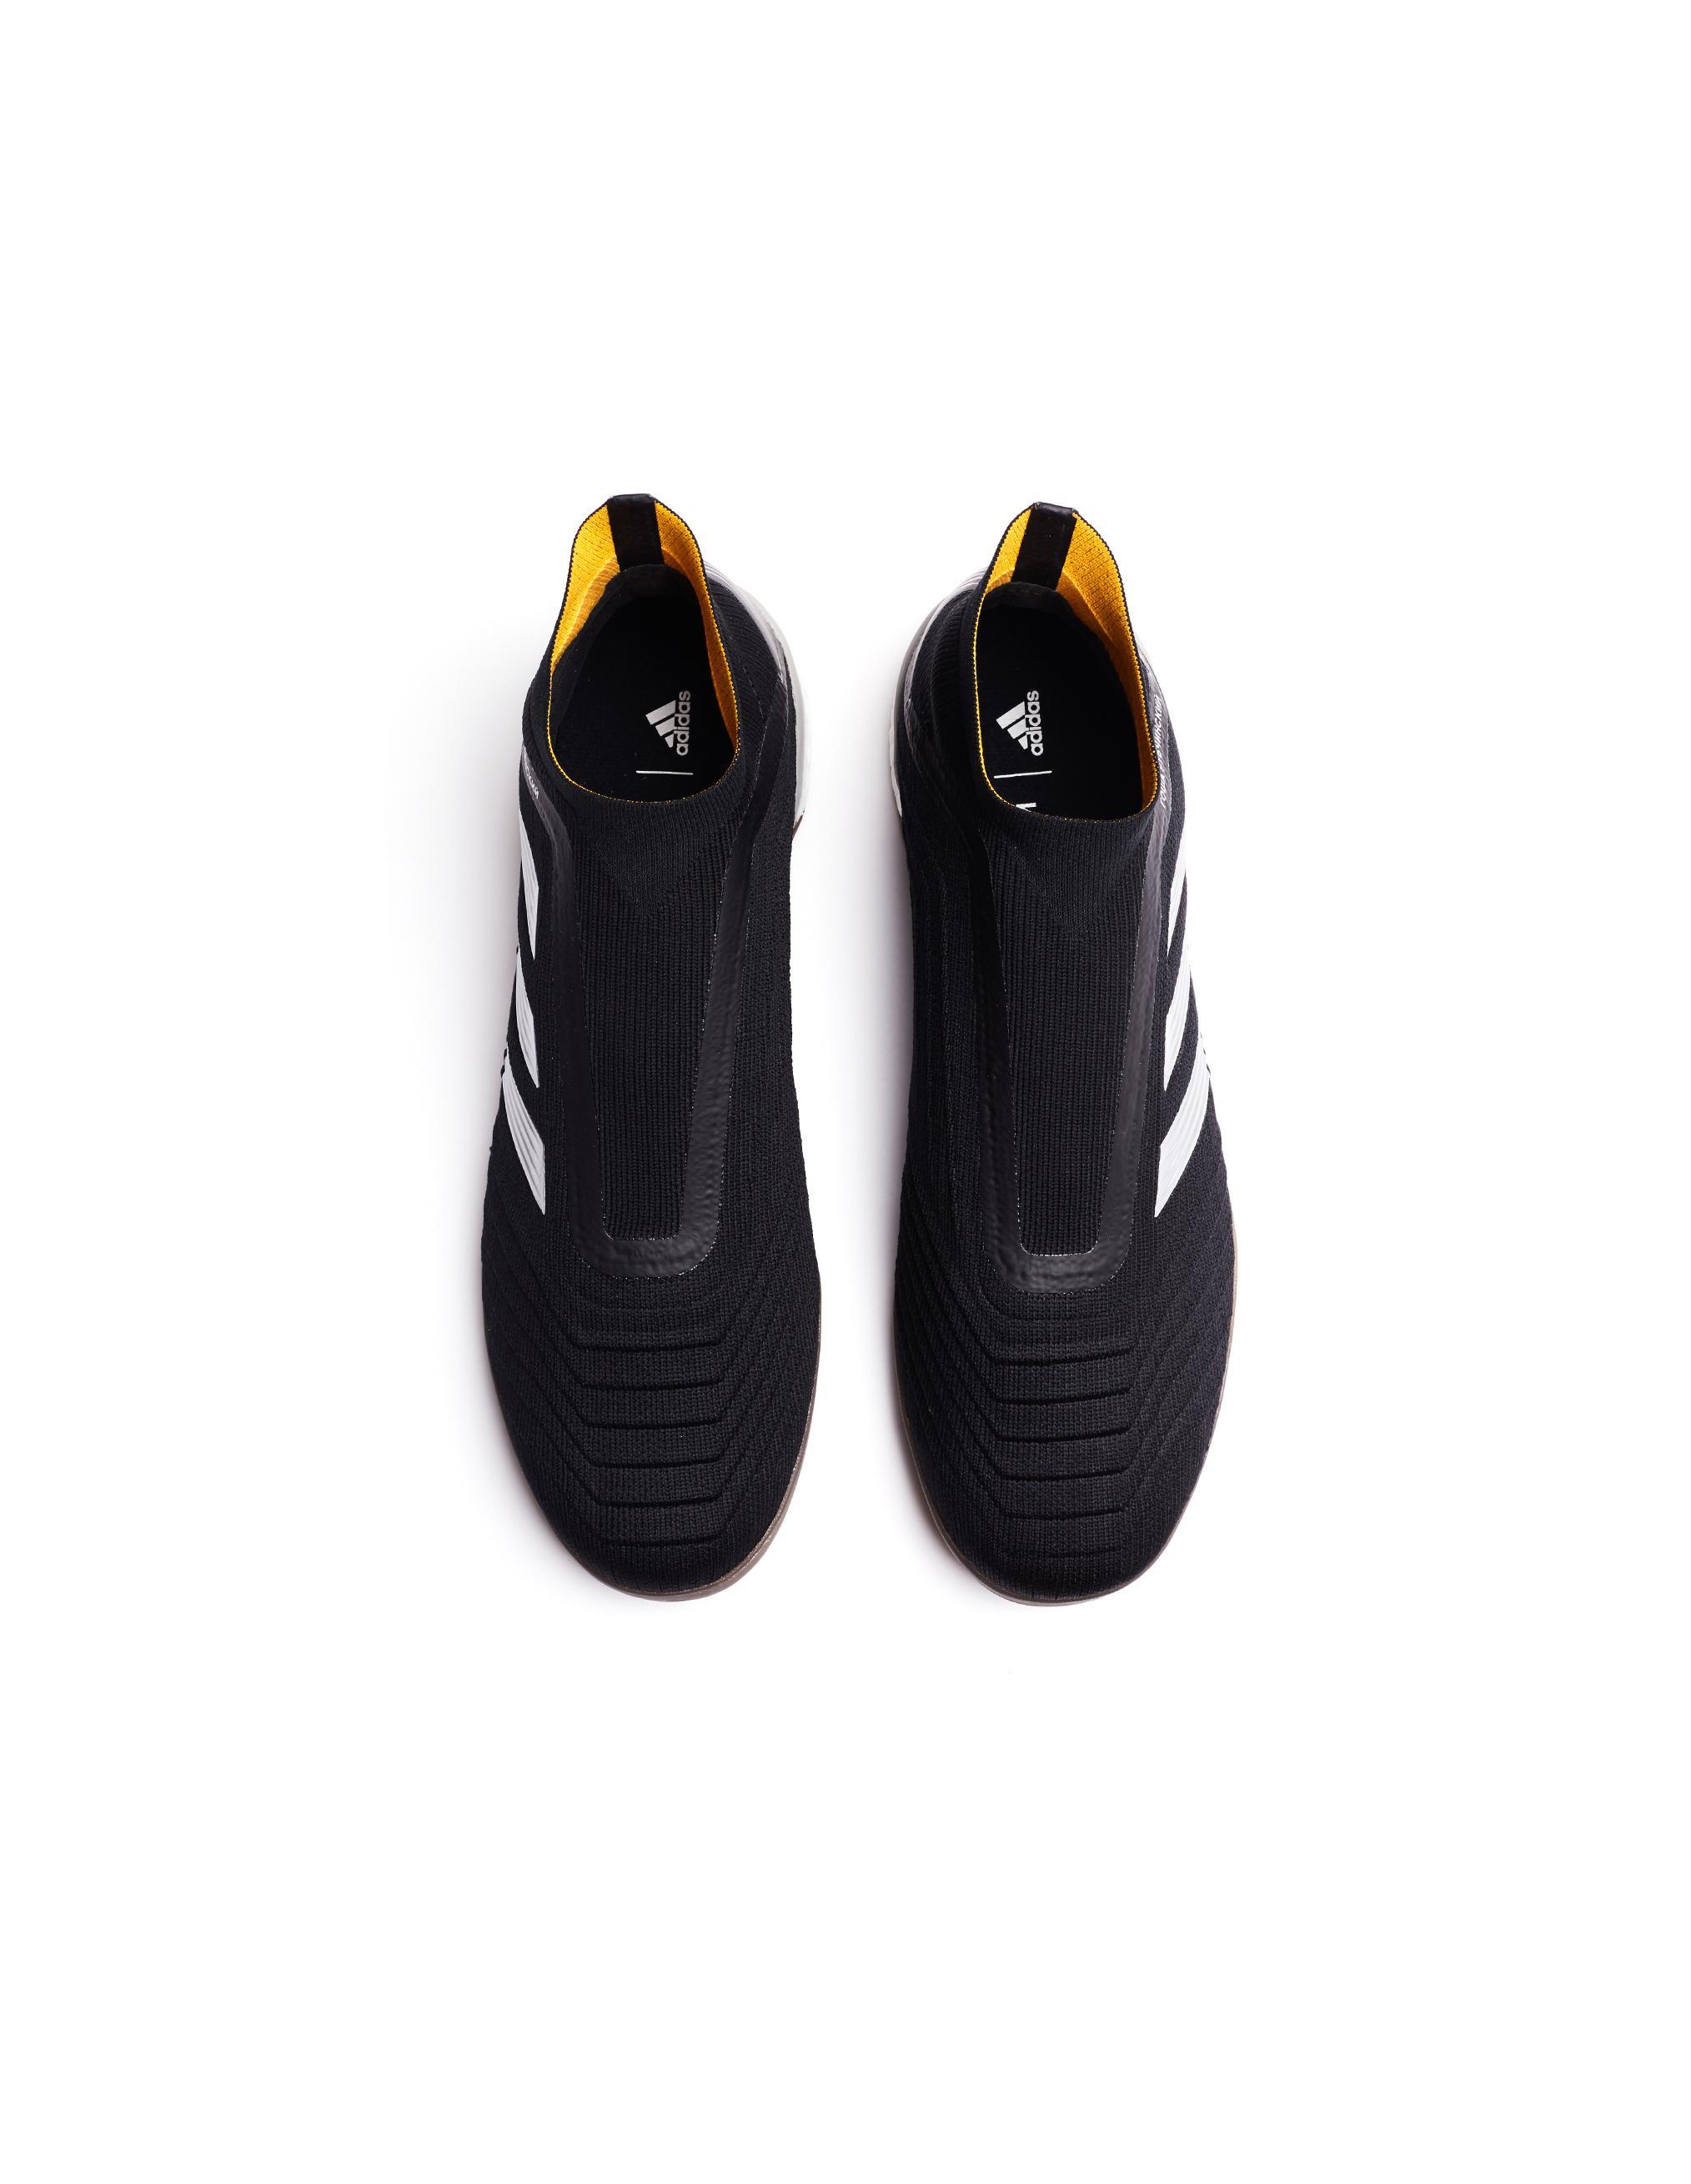 12dea6912 Gosha Rubchinskiy - 'predator' Black Textile Sneakers for Men - Lyst. View  fullscreen